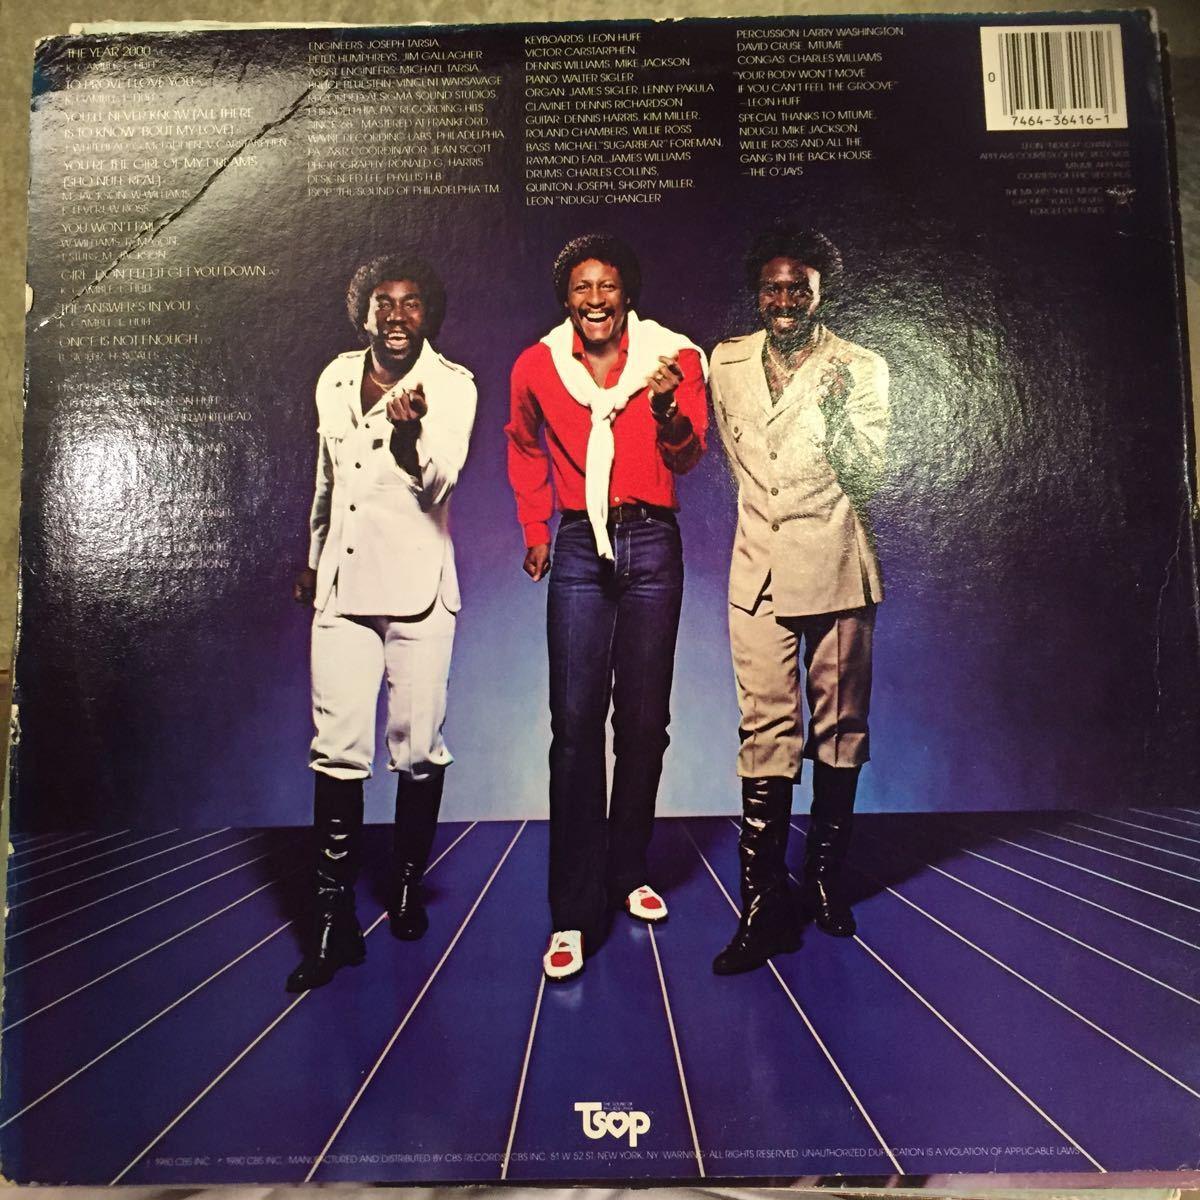 TSOP/THE O'JAYS/THE YEAR 2000/US盤 中古レコード_画像2